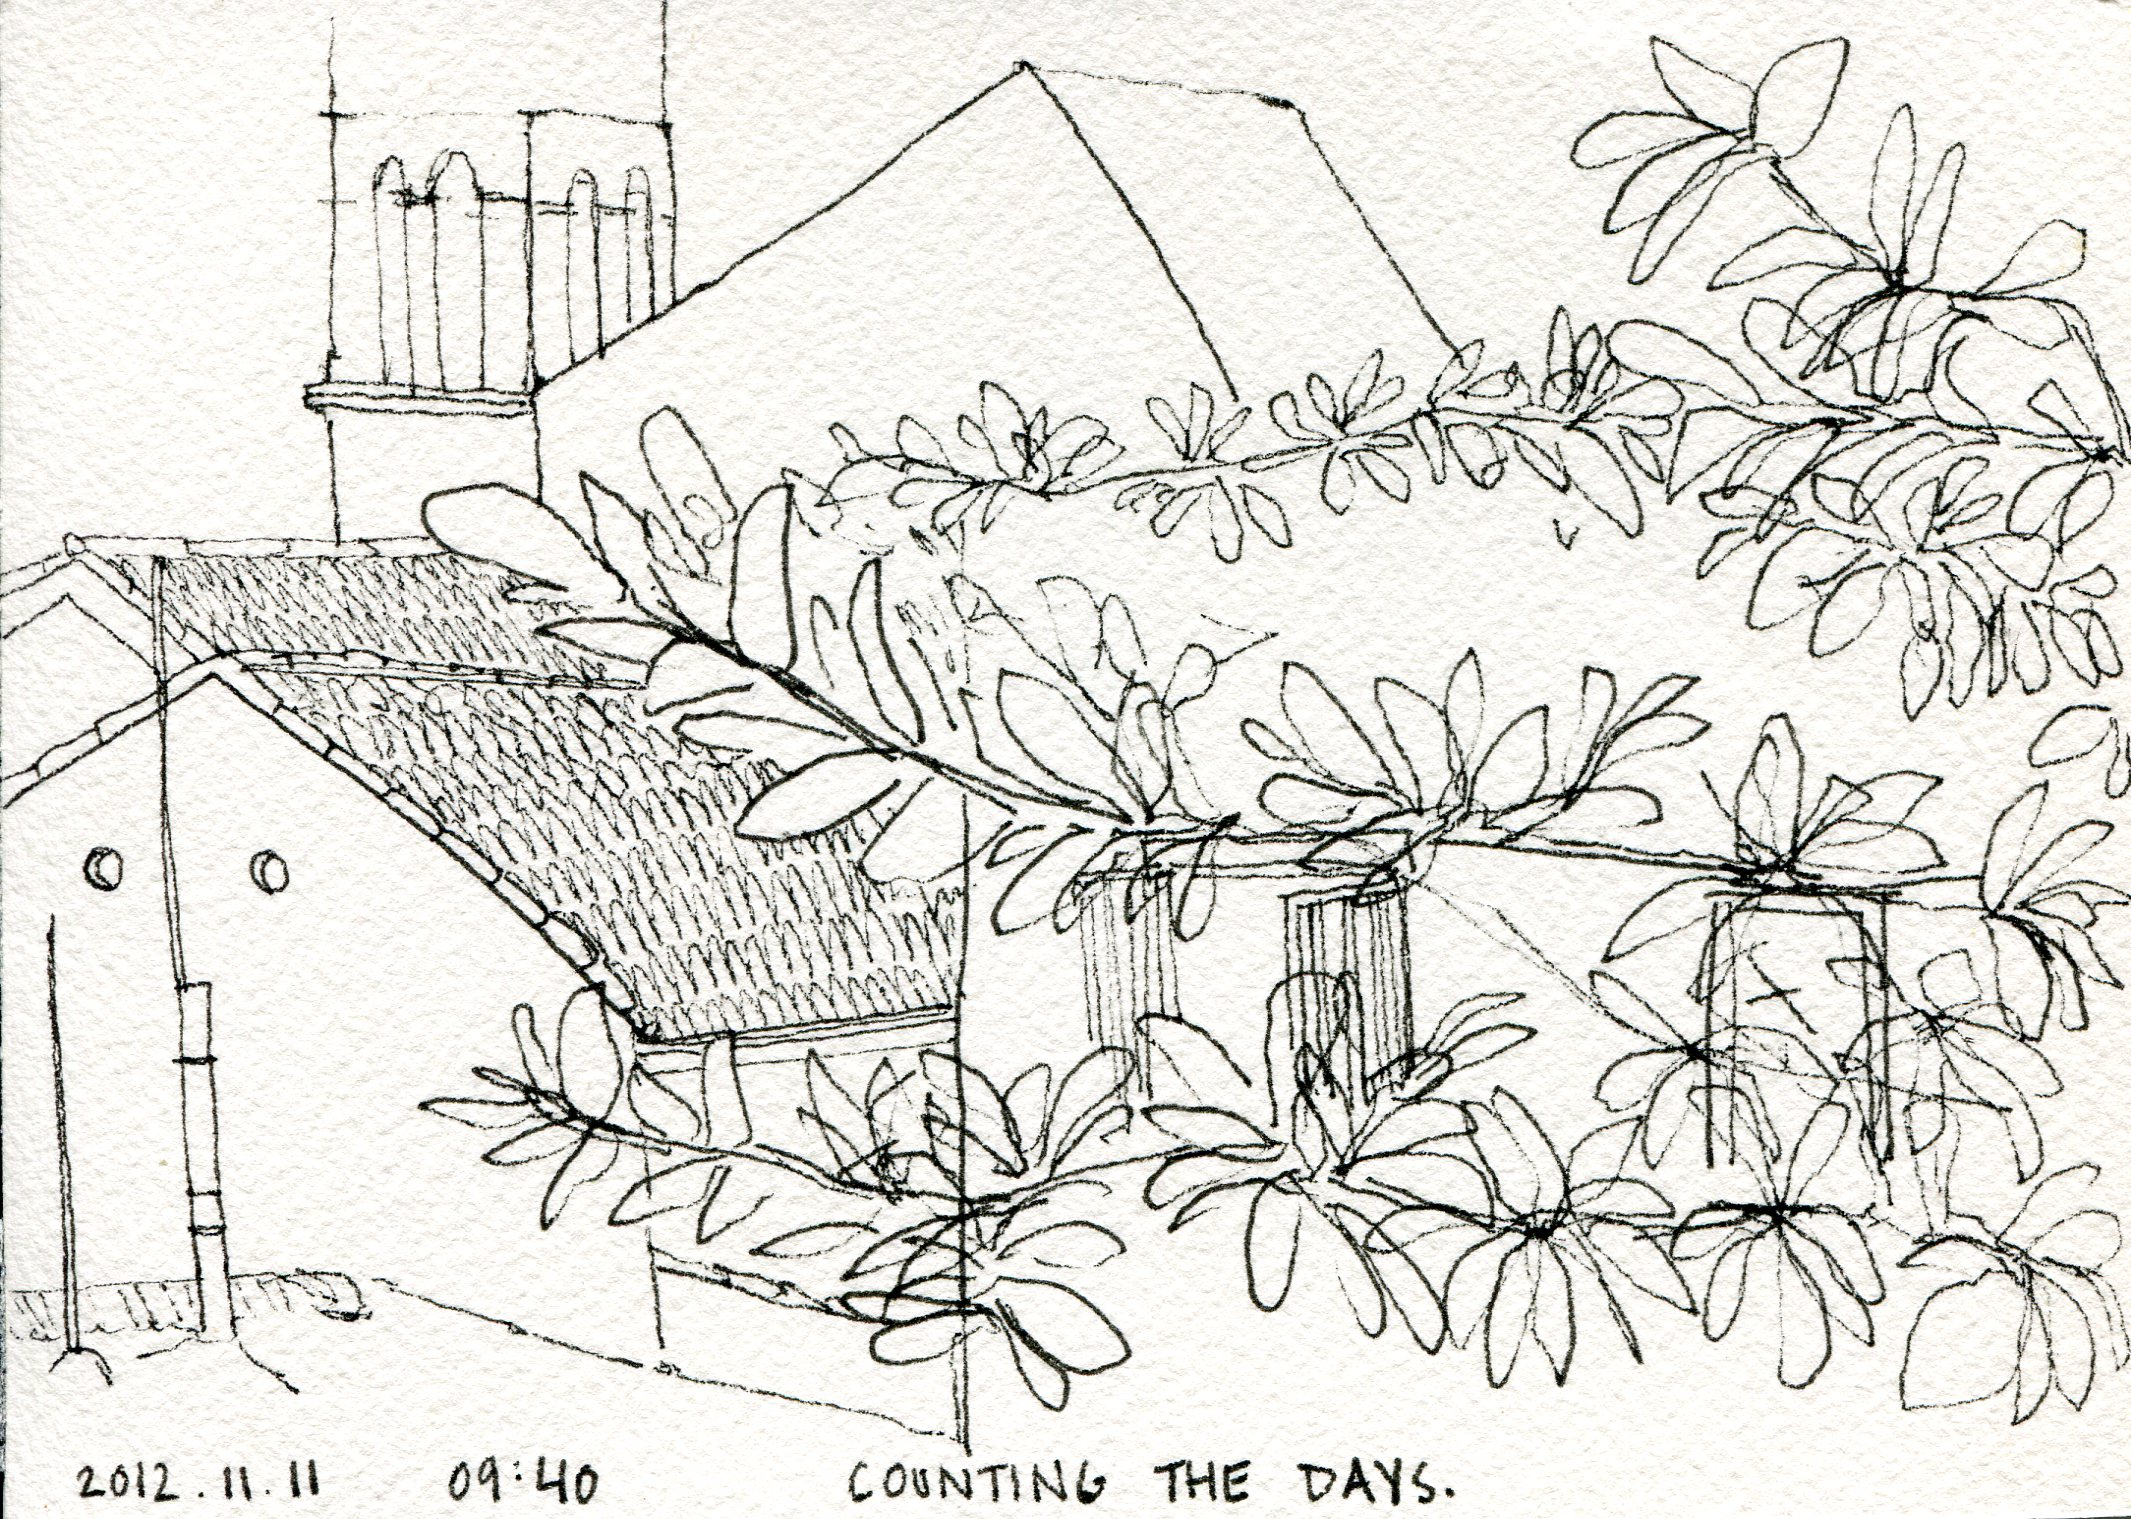 2012-11-18 drawing008.jpg